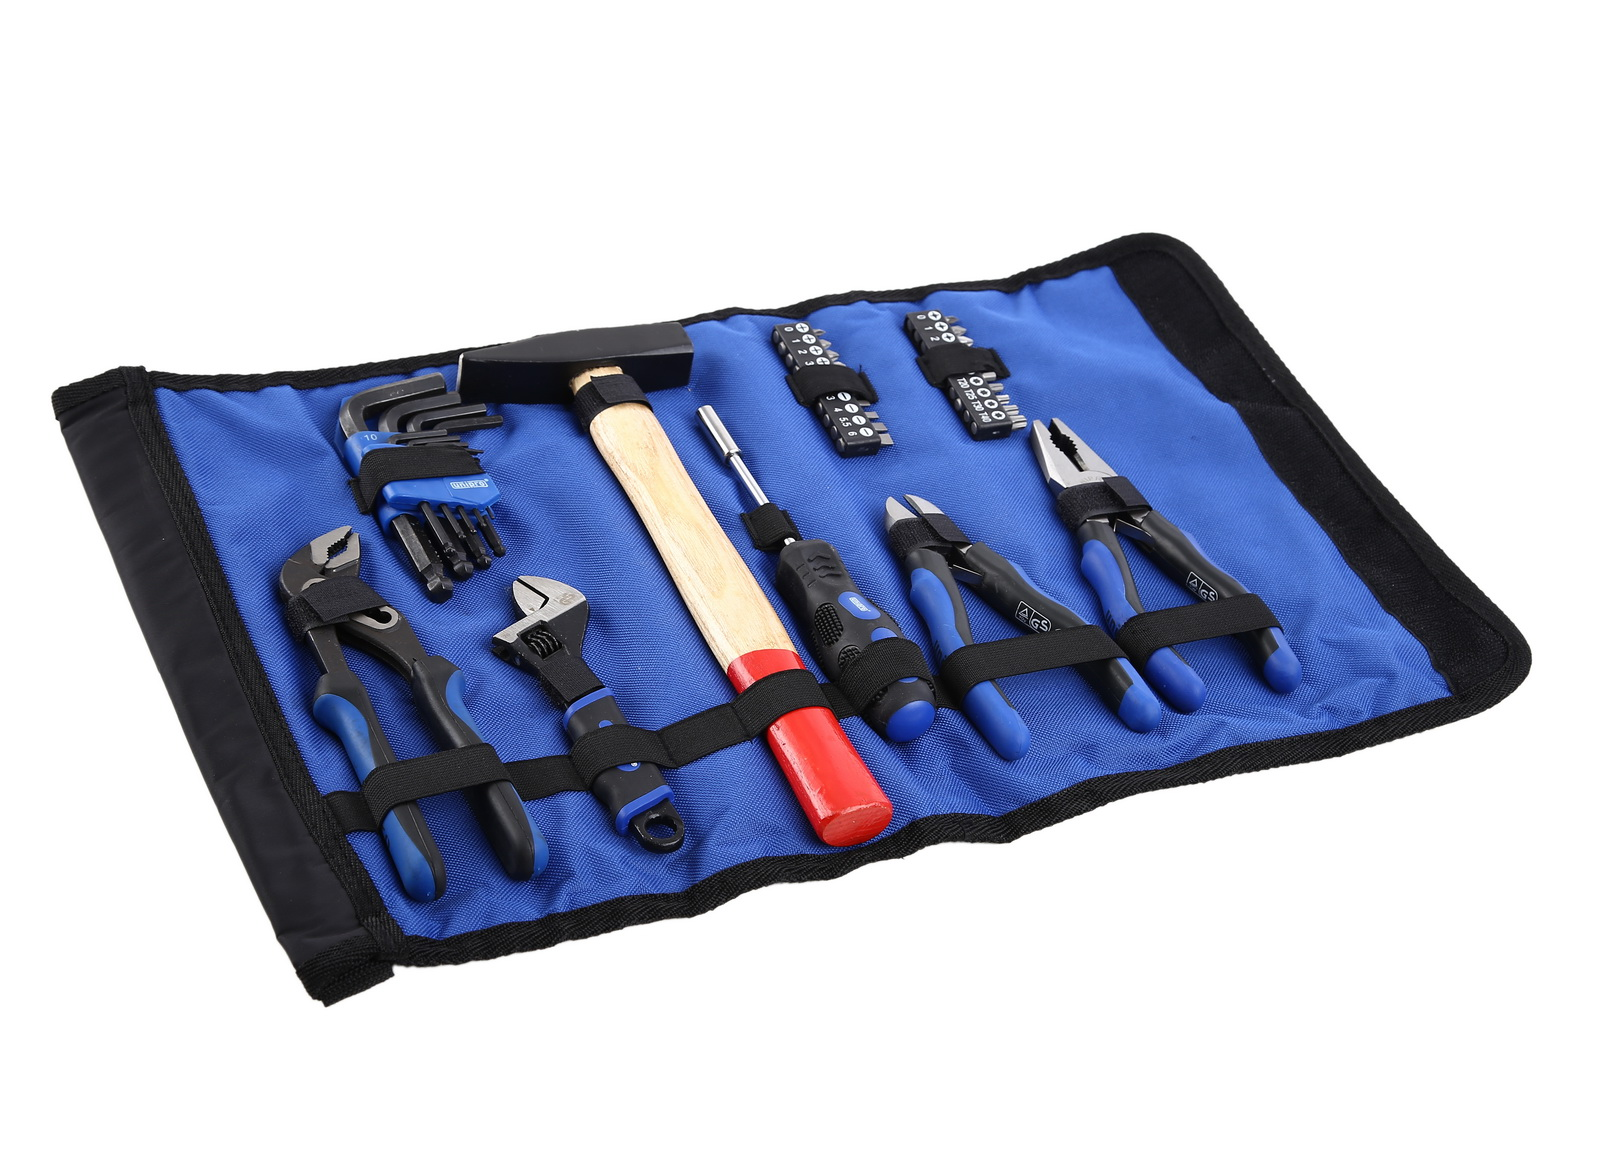 цена на Набор инструментов для электрика в сумке-рукаве с ремнем, 35 предметов Unipro U-770